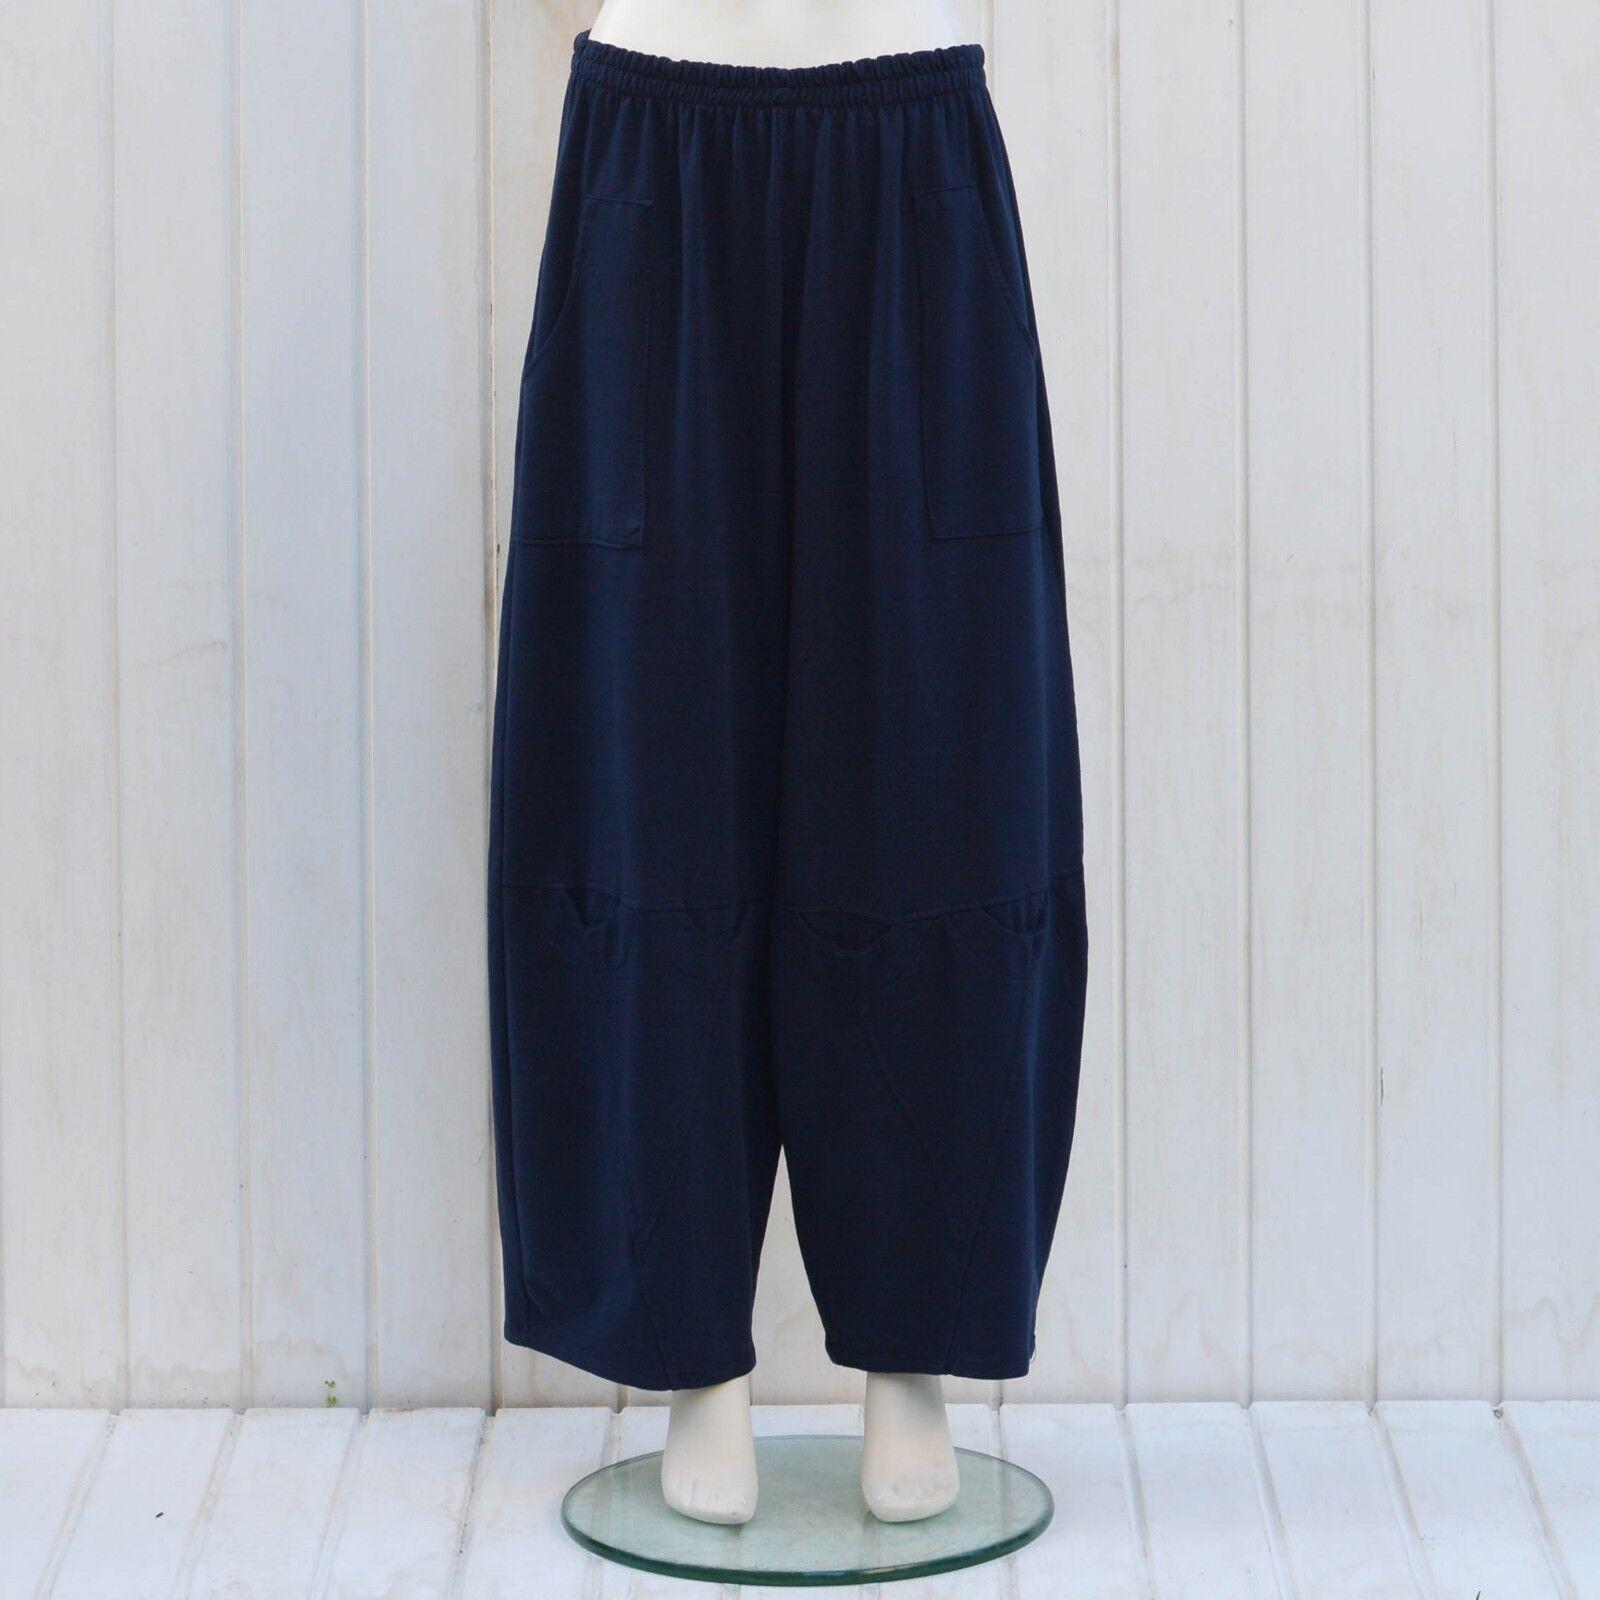 Plus Größe damen Trousers Pants Lagenlook Loose 16 18 20 22 24 26 28 30 32 9820